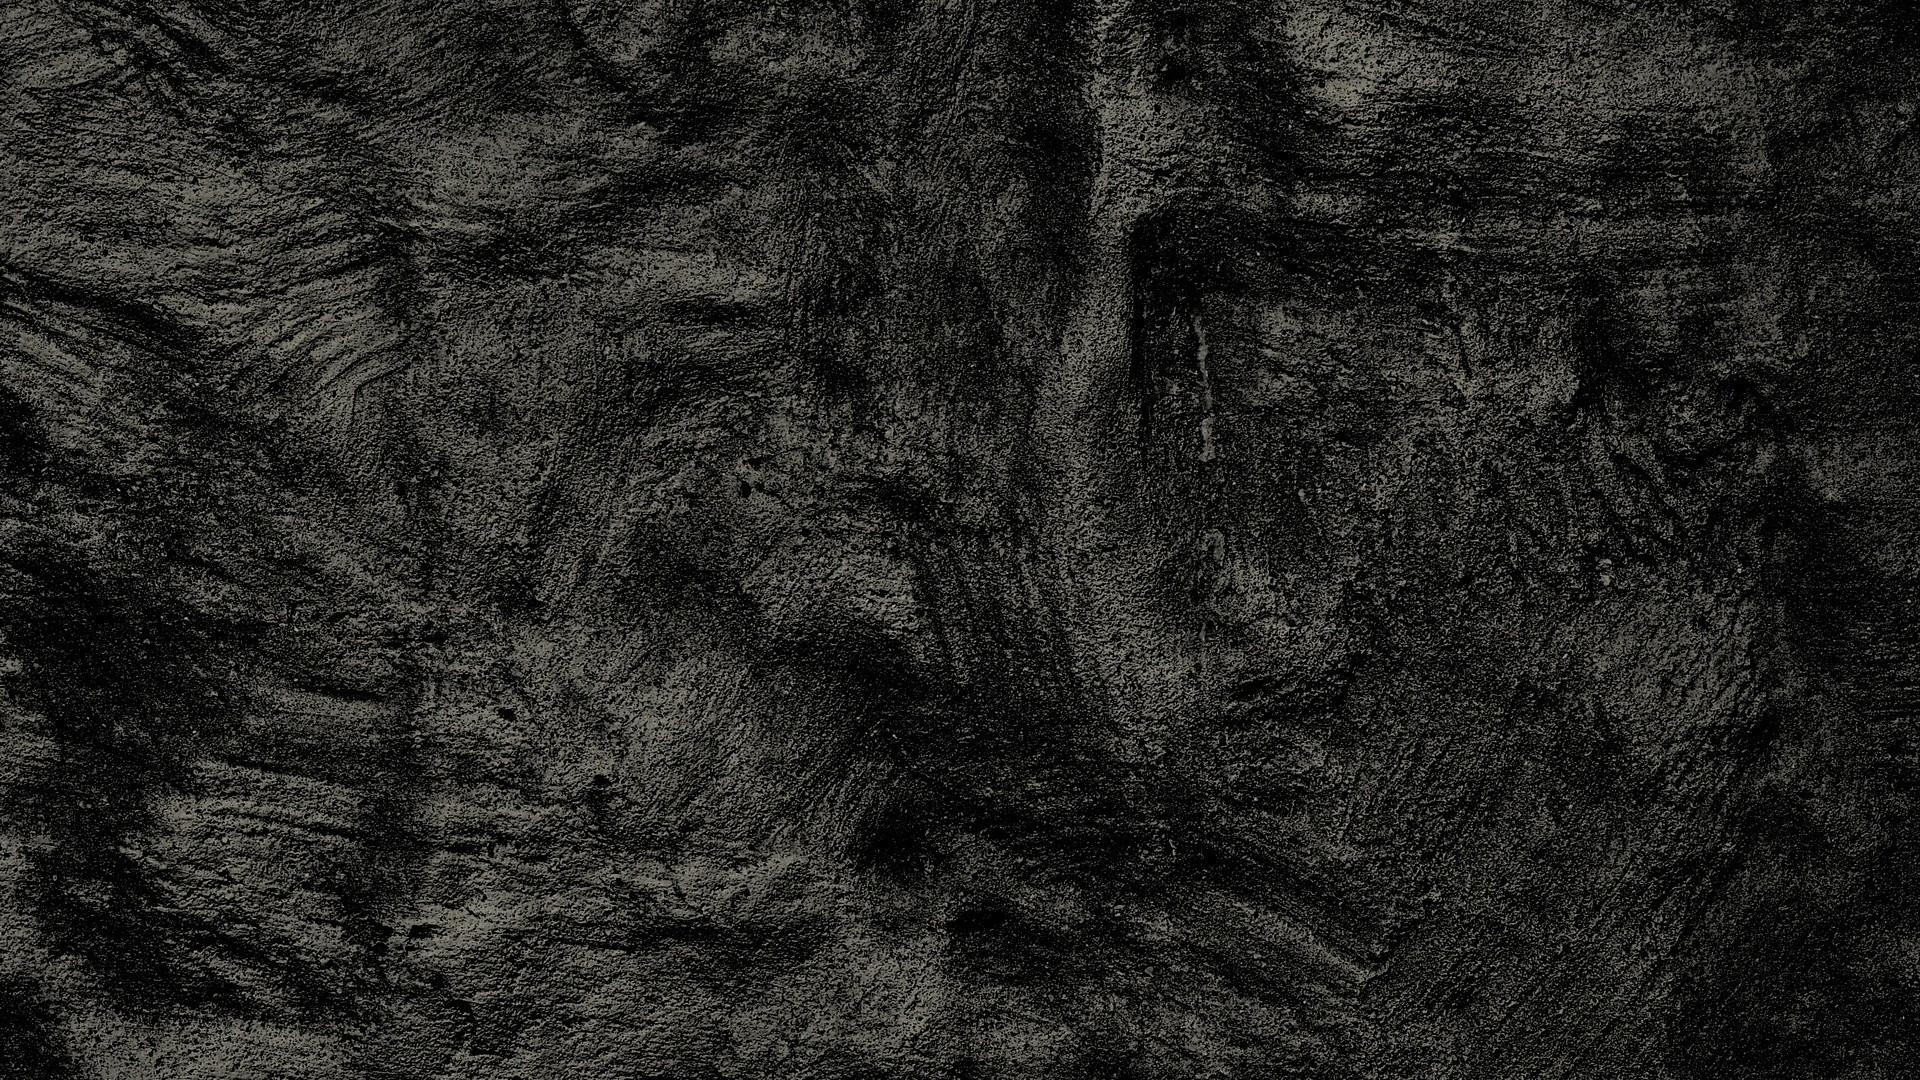 Black · Black color wallpaper